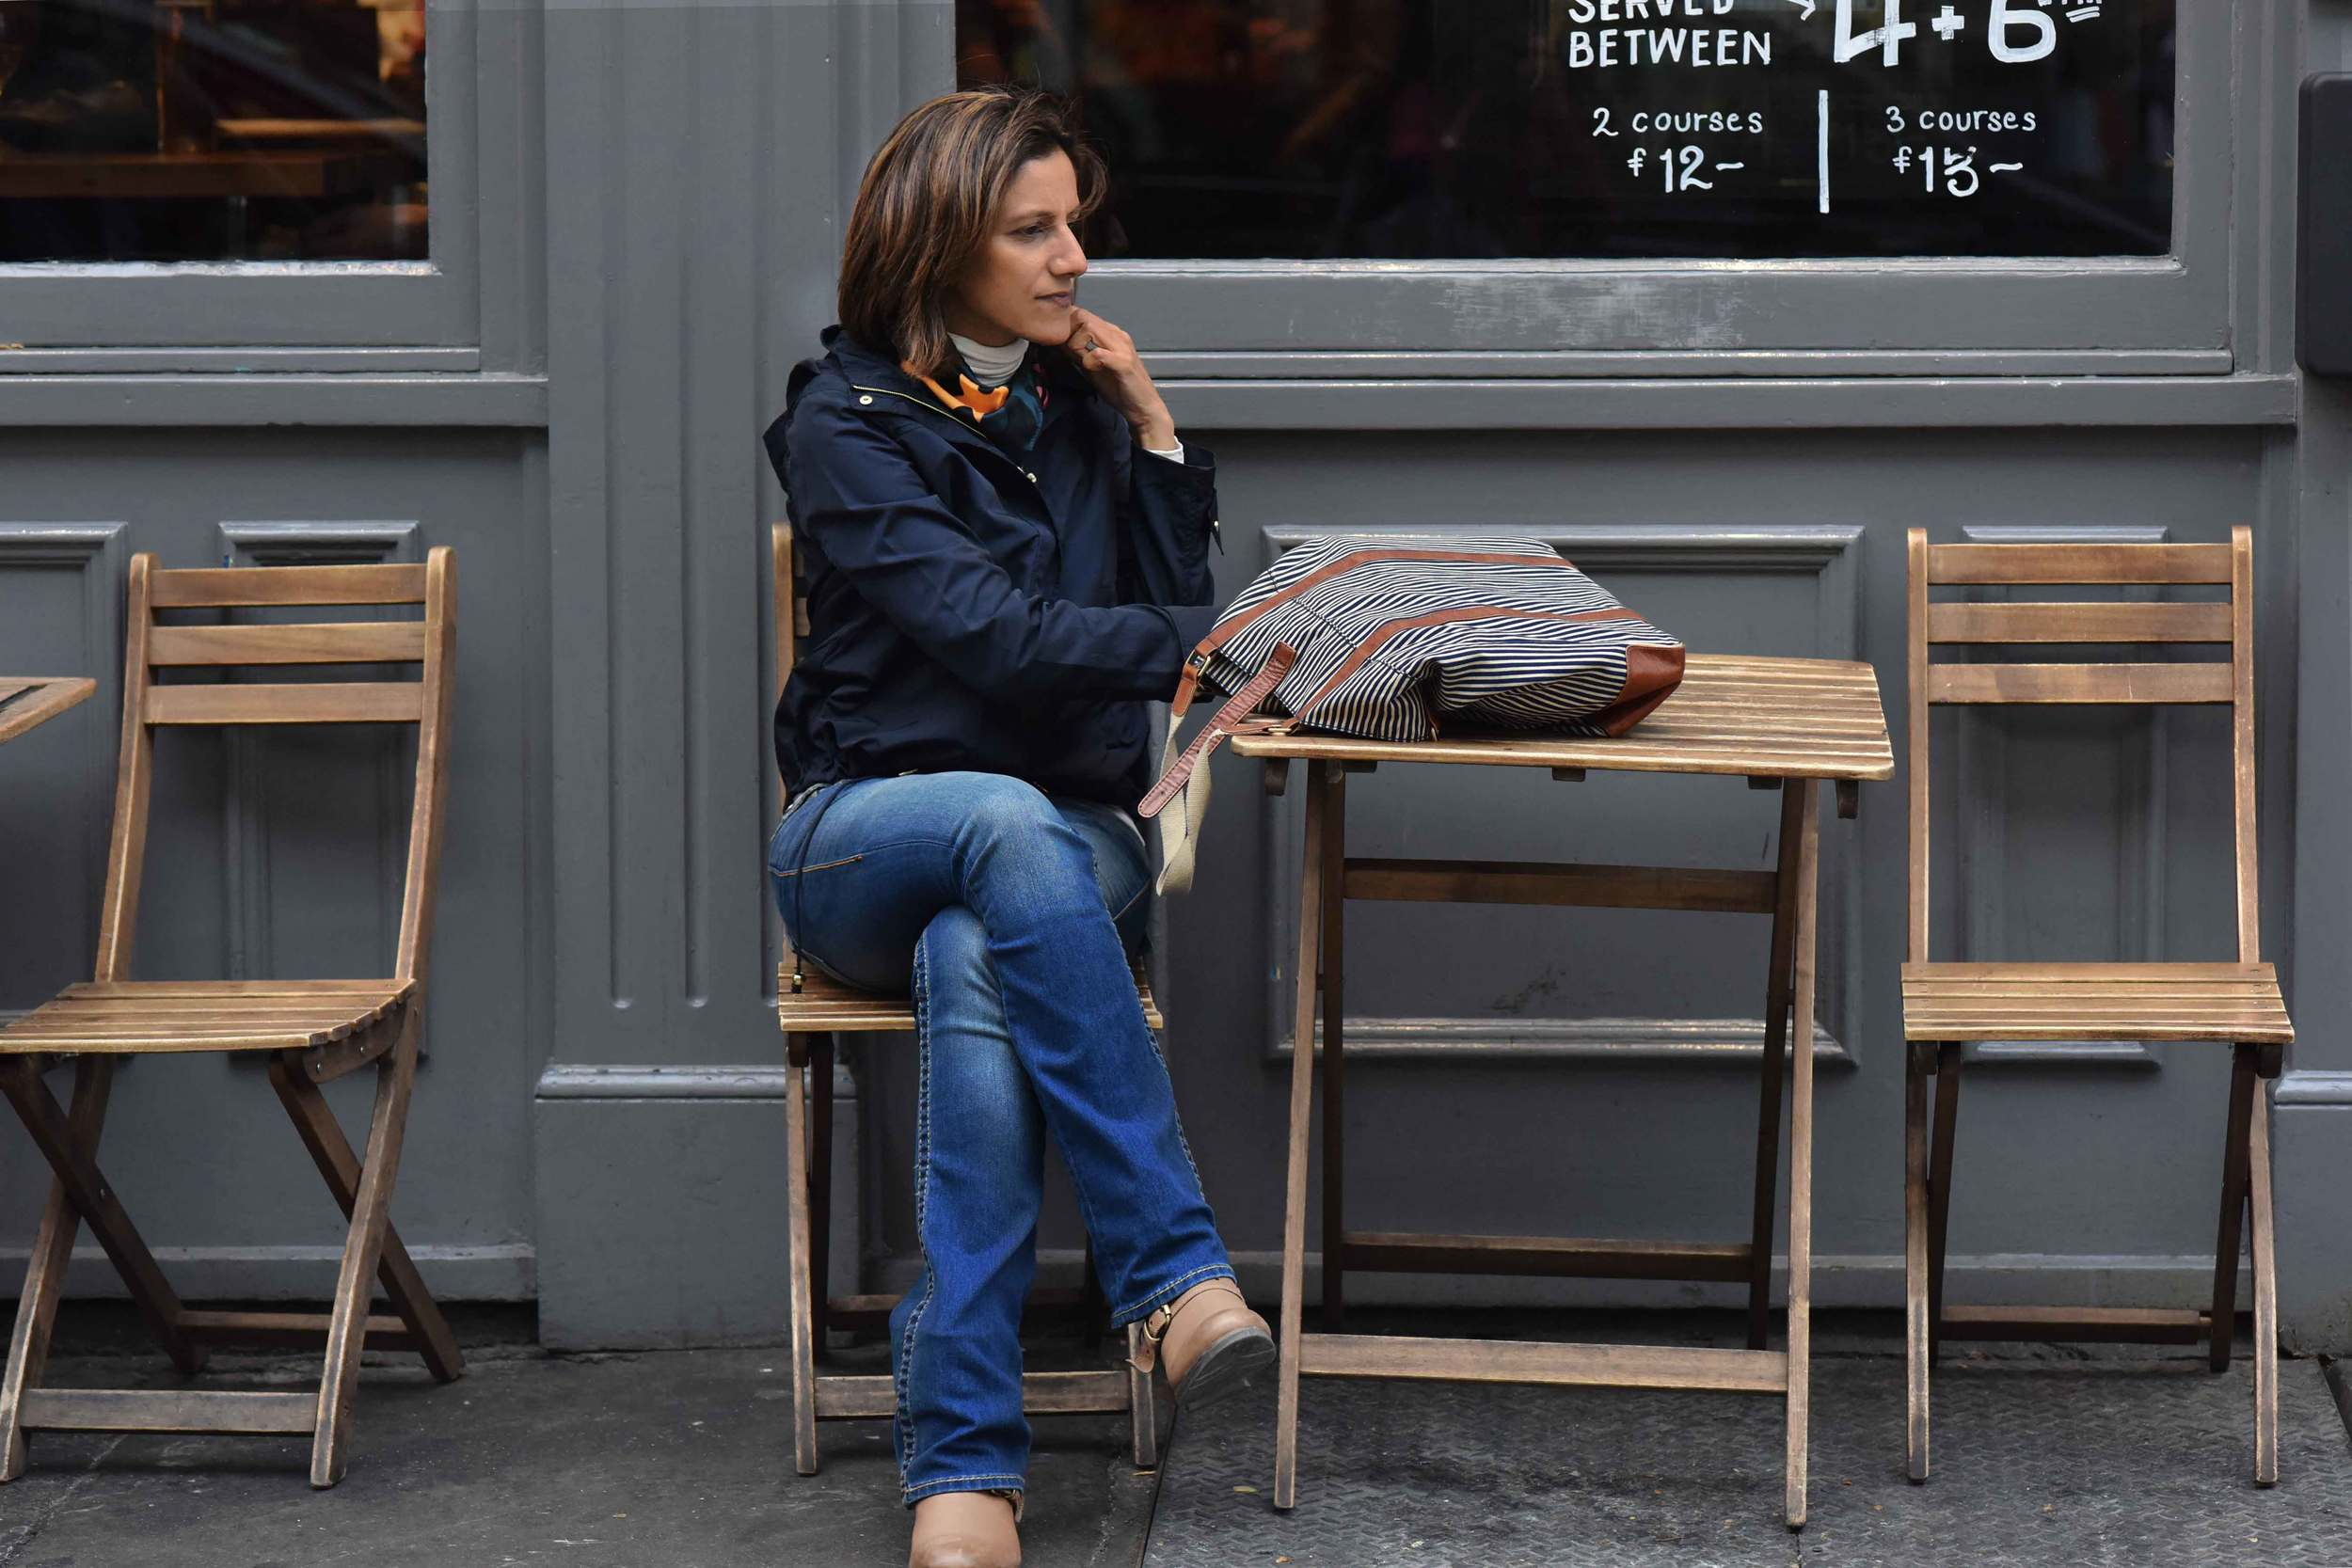 Zara water repellent jacket, Ralph Lauren polo sweater, Zara printed pocket square, Zara bandana print umbrella, True Religion jeans, Uggs boots, Covent Garden, London, UK. Image©sourcingstyle.com